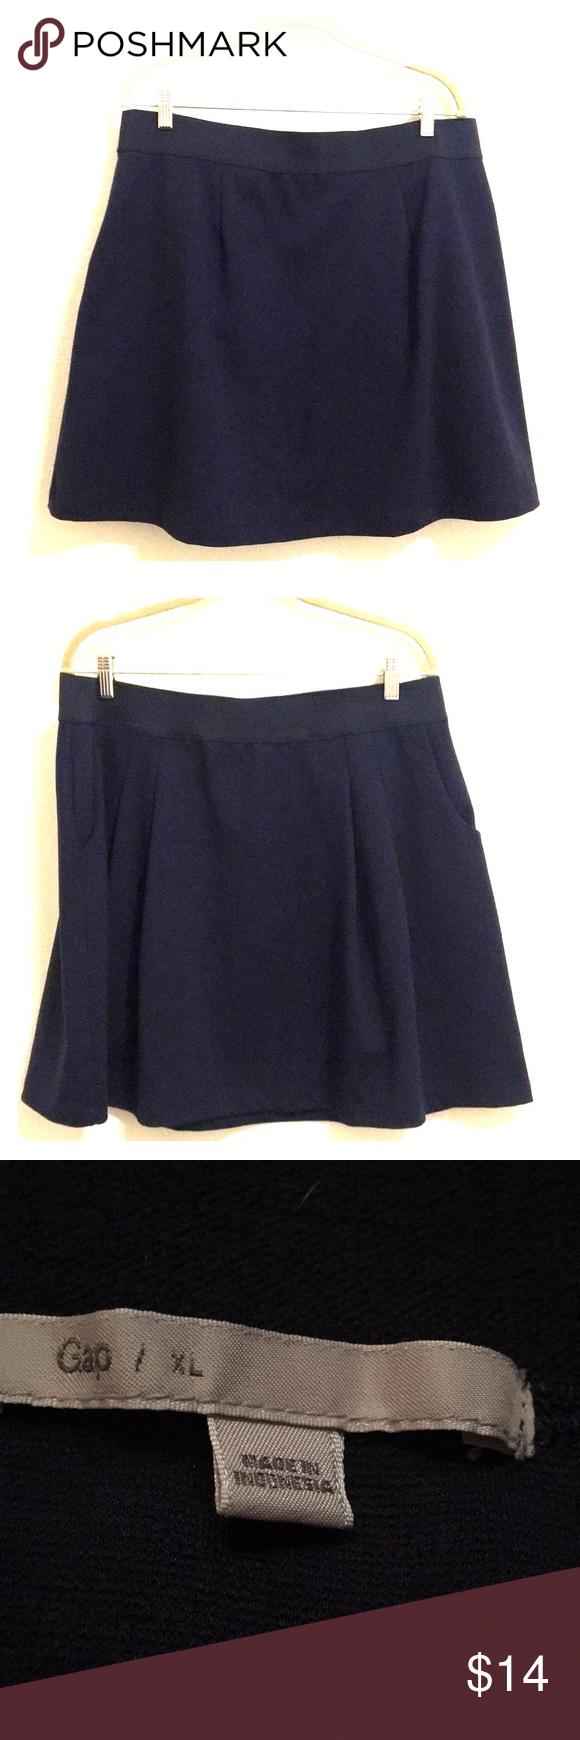 "fa66ac8c3 Gap Knit Stretch Skate Skirt with pockets indigo 18"" flat across waist 19""  in length Pockets Circle skirt GAP Skirts Circle & Skater"